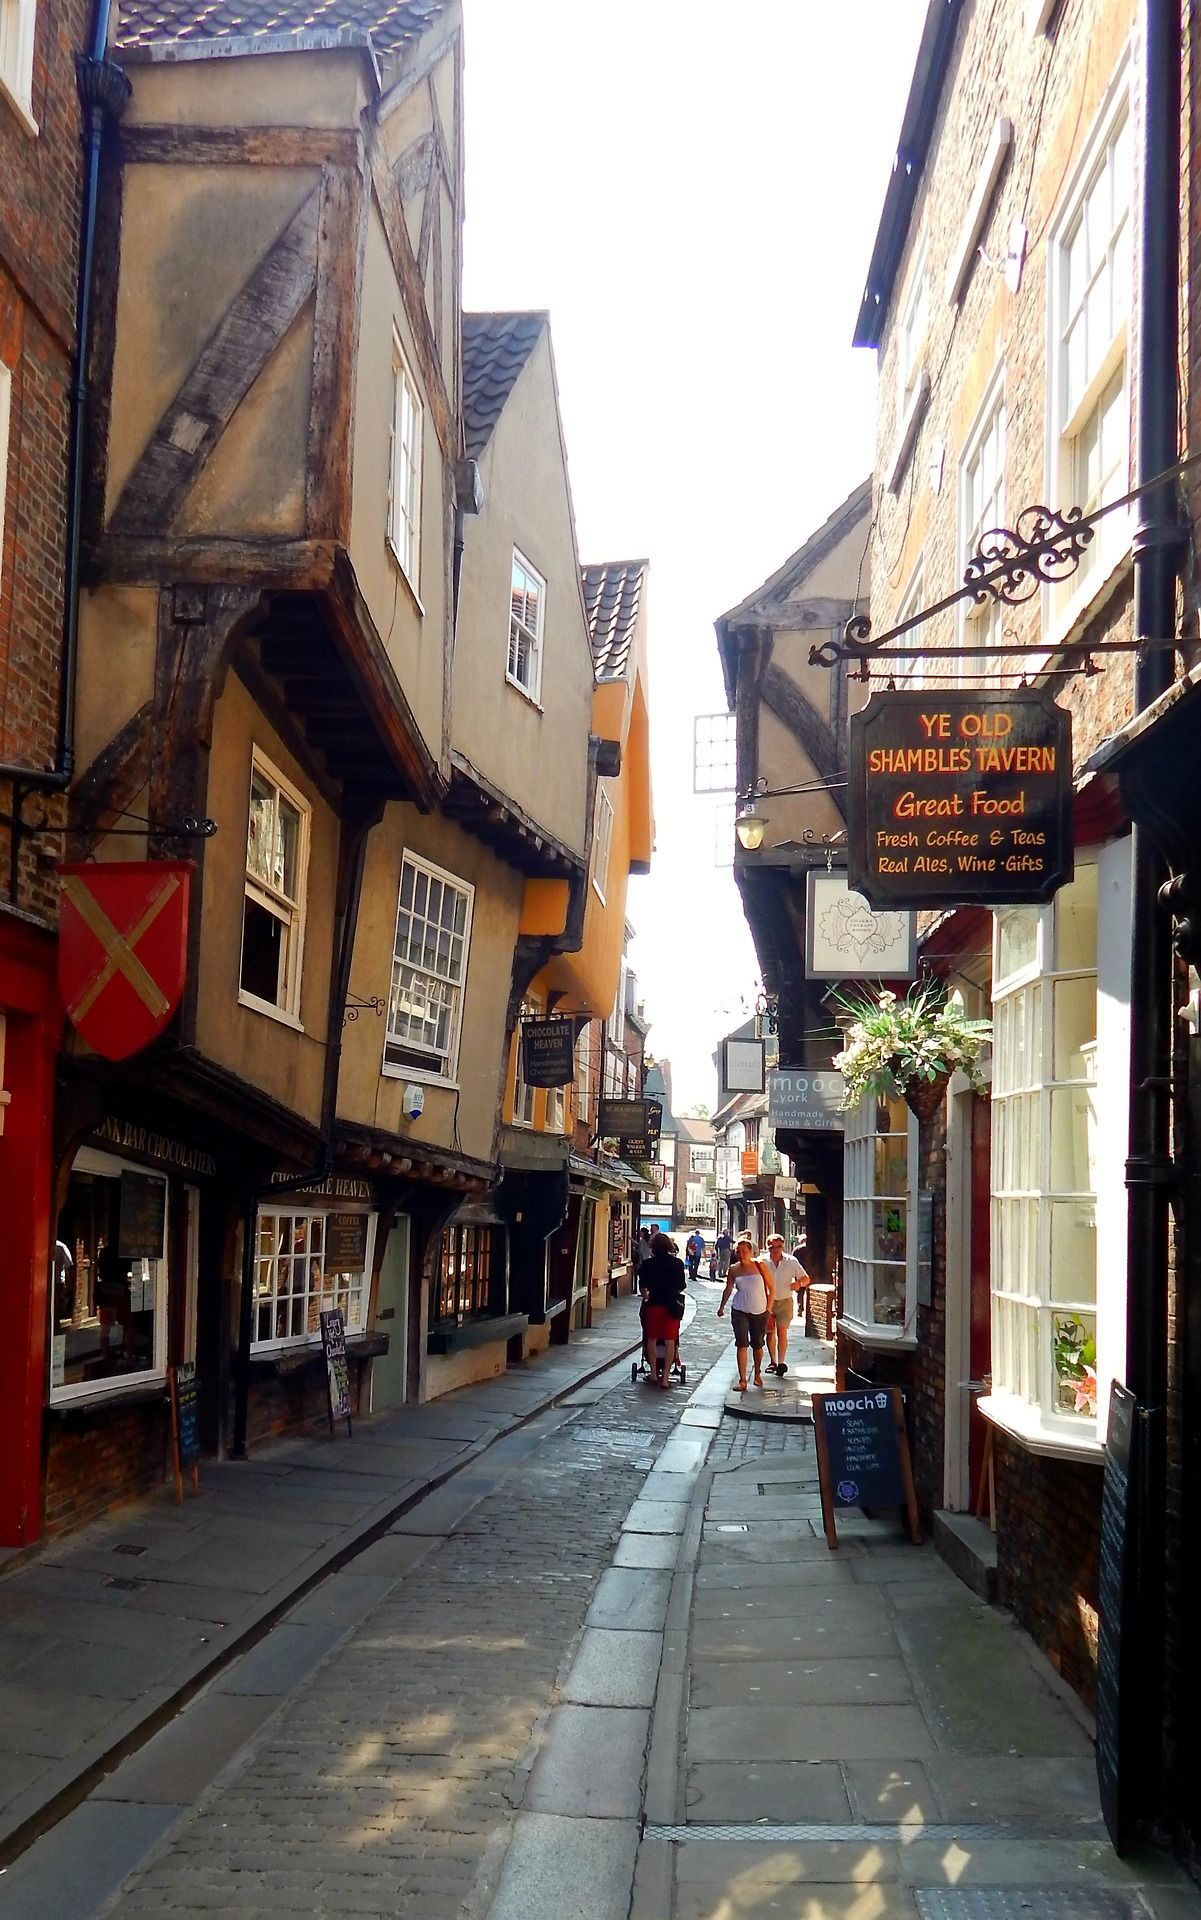 The Shambles, York, England, UK | York england, England, England travel